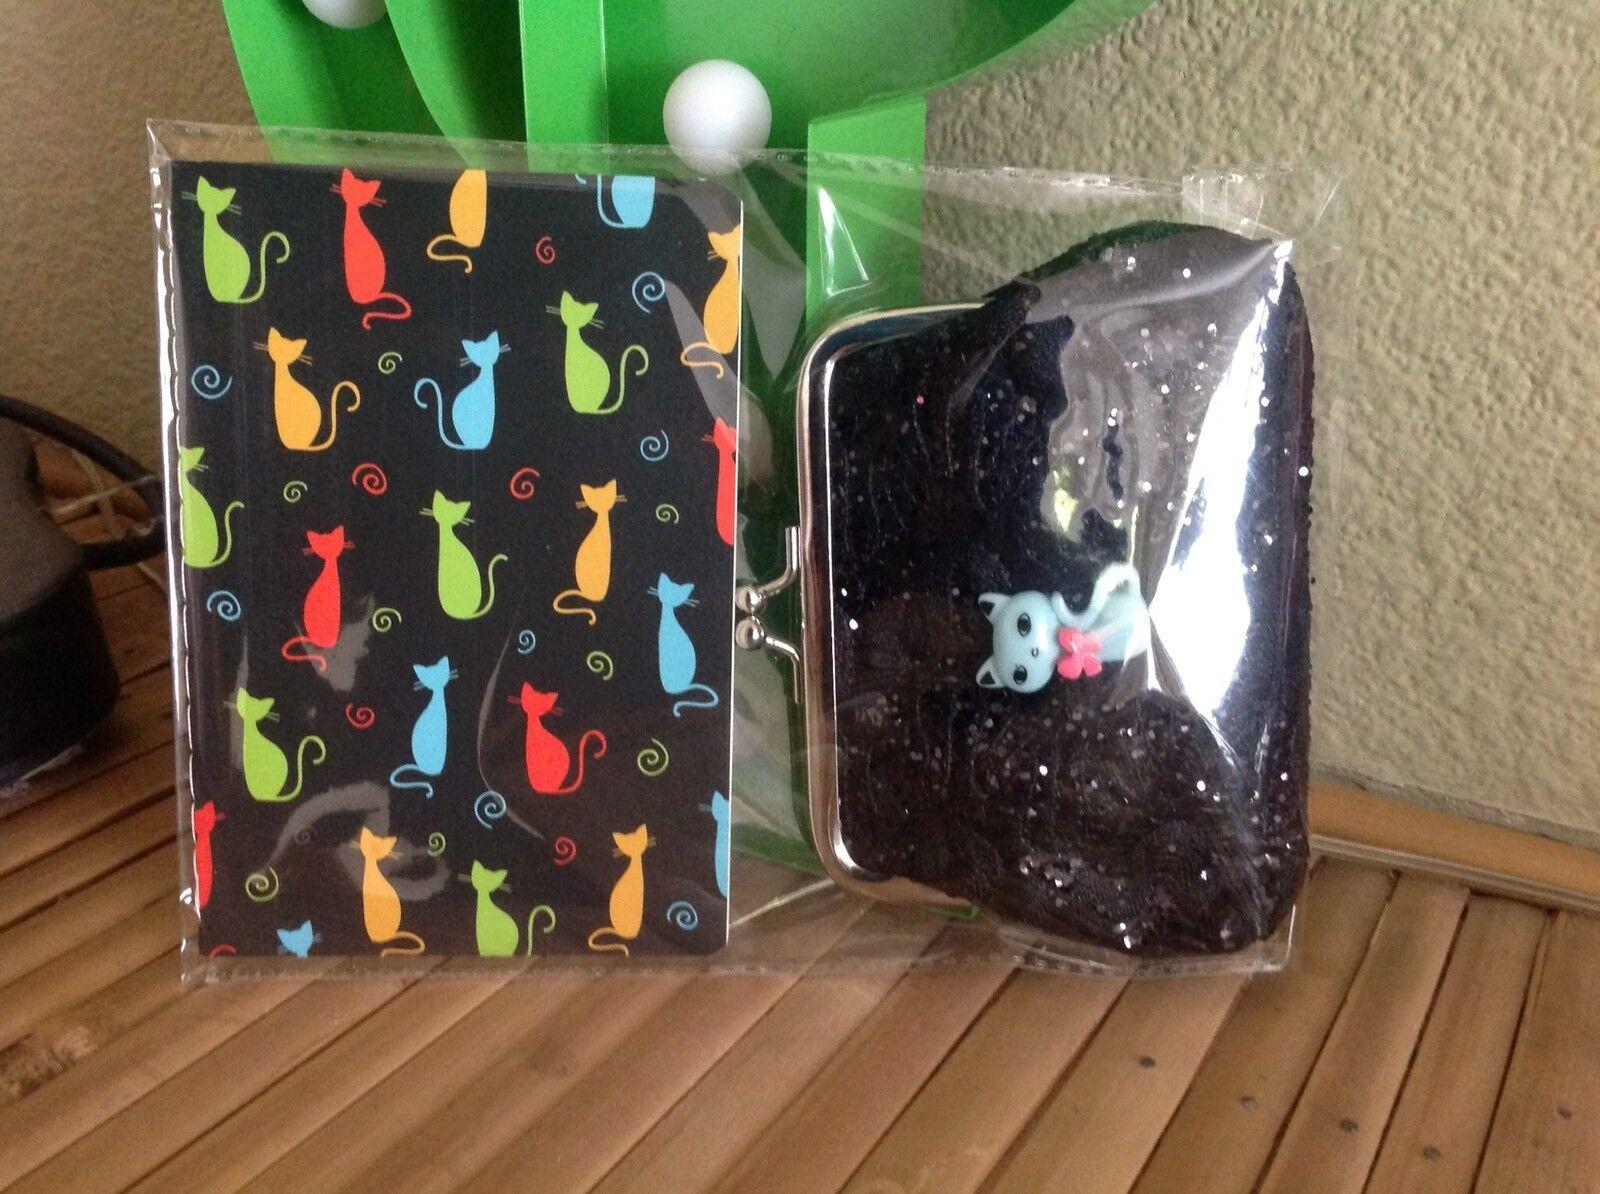 Retro Atomic Cat 50s Kitty Kitsch Black Glitter Purse +Notebook 2 Piece Gift Set